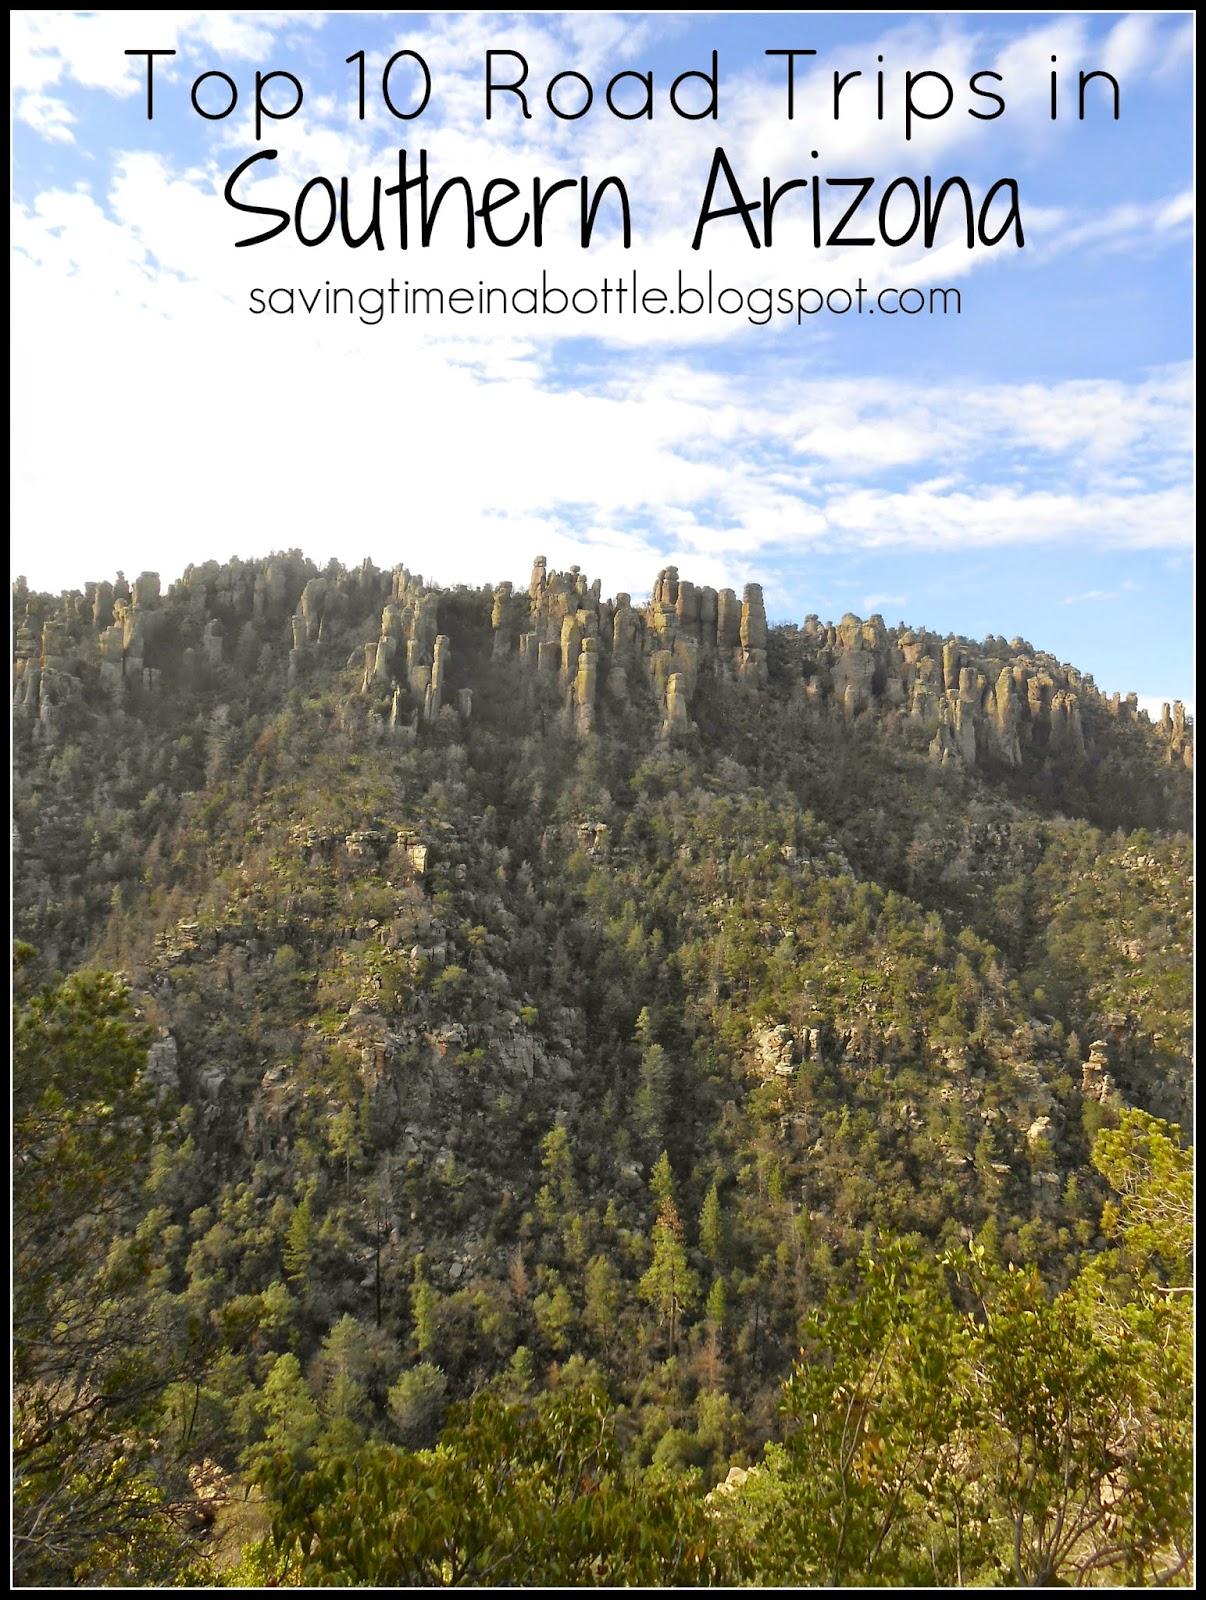 arizona, road trips, where to go in arizona, vacation, road trip ideas